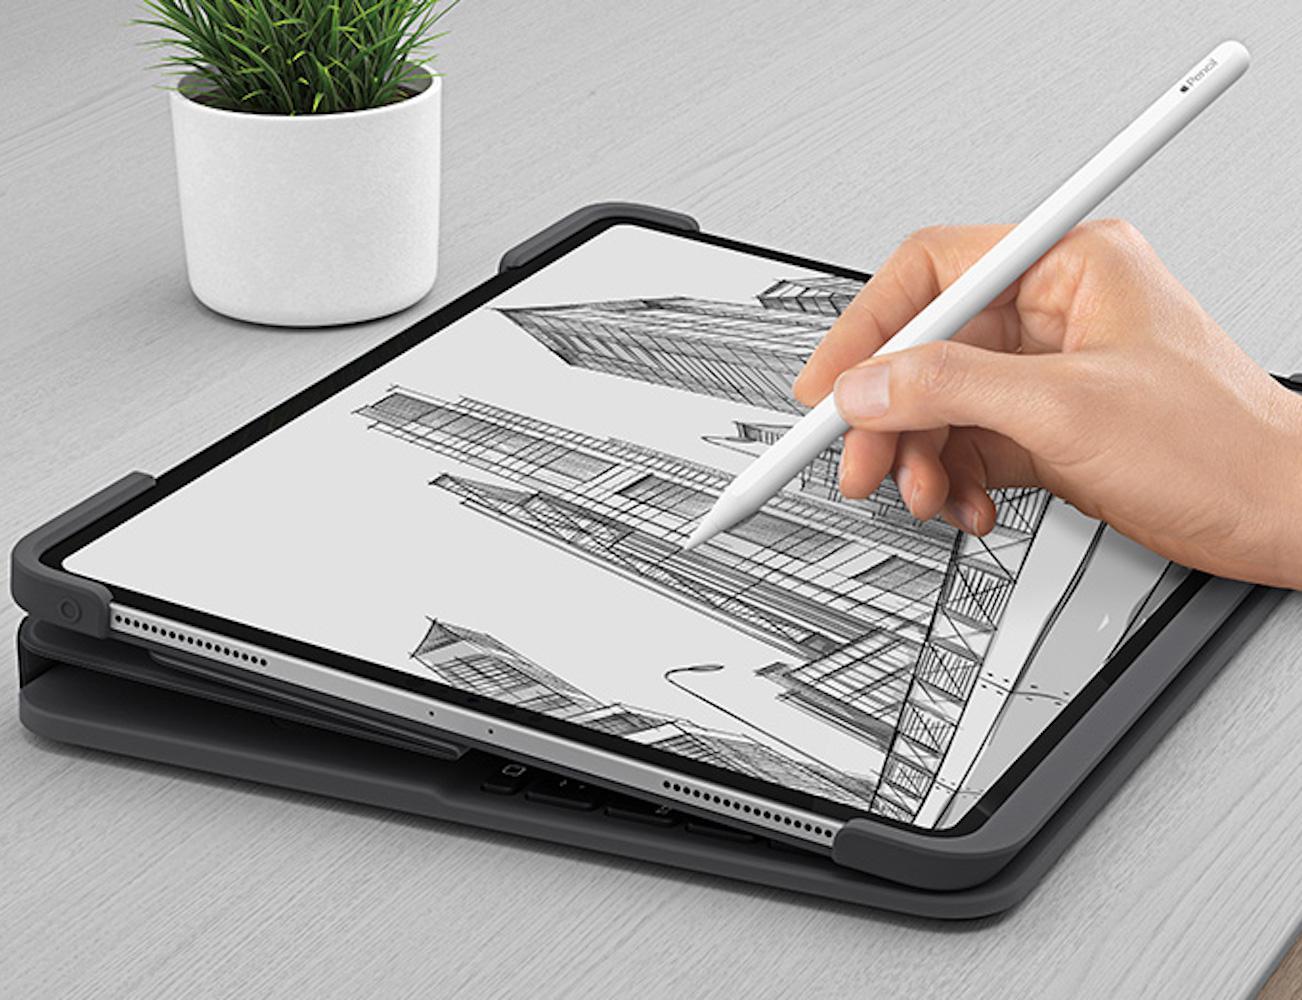 Logitech Slim Folio Pro iPad Pro Keyboard Case